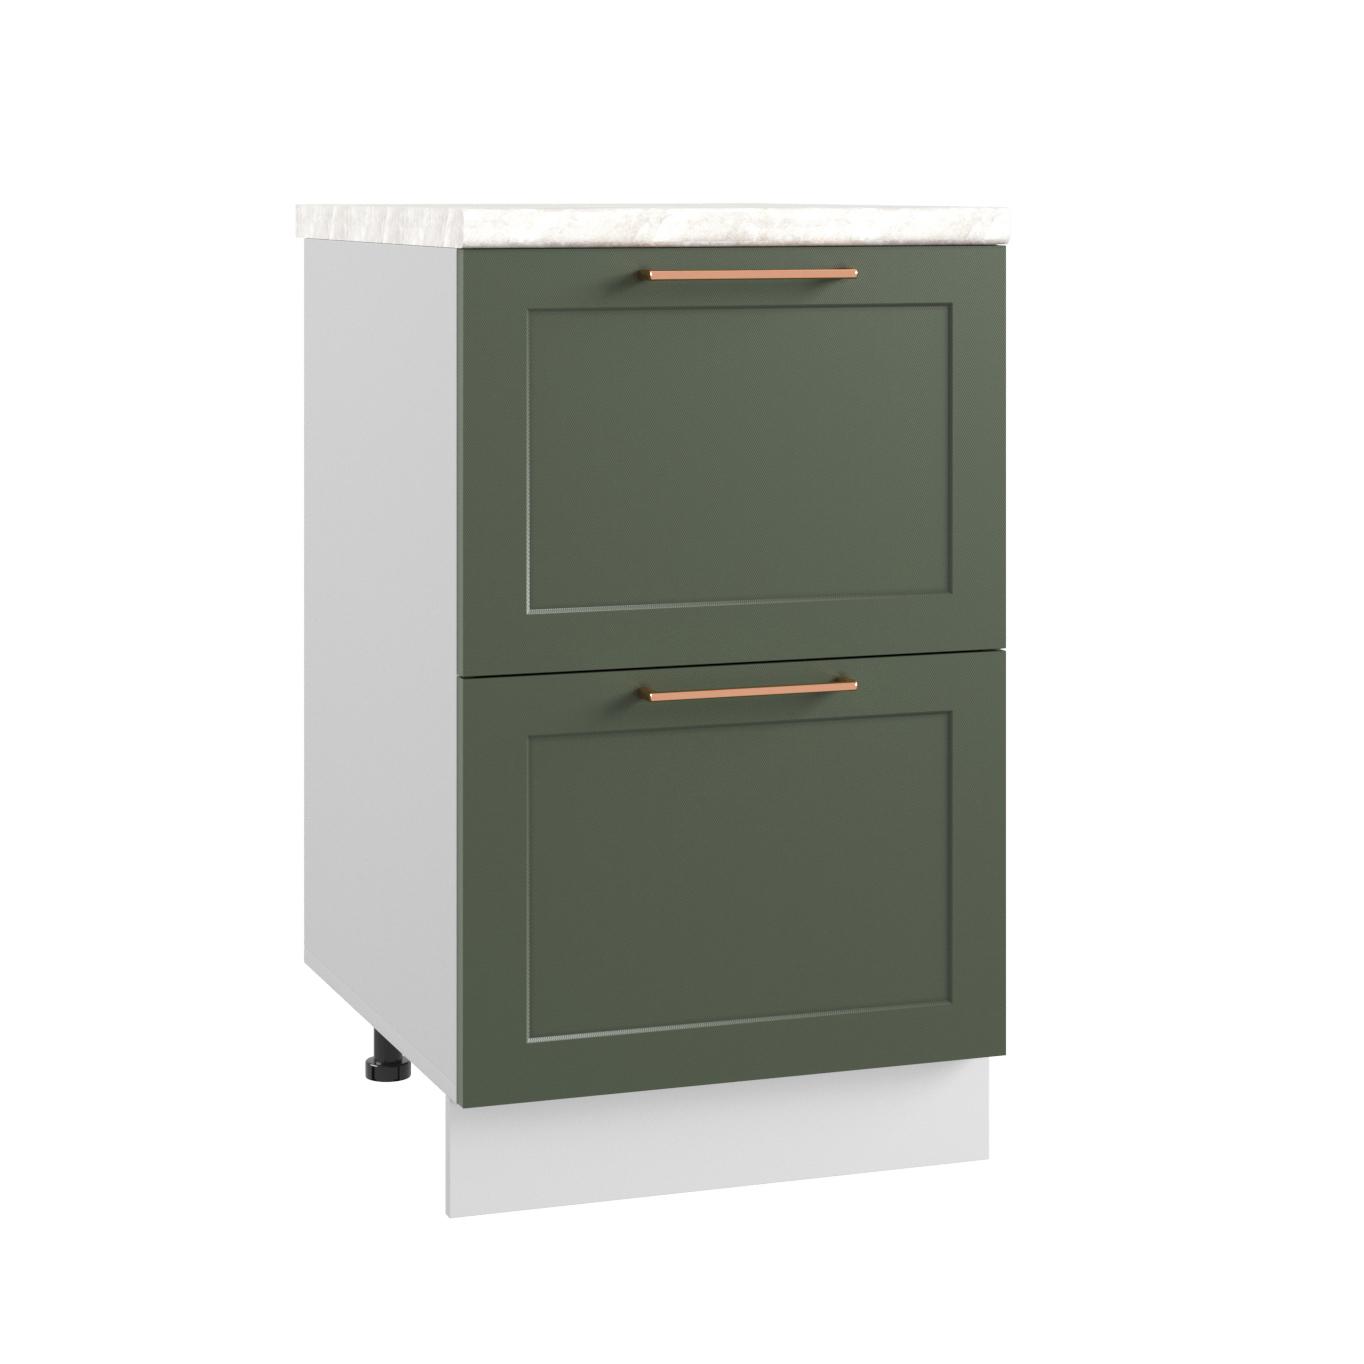 Кухня Квадро СК2 500 Шкаф нижний с ящиками